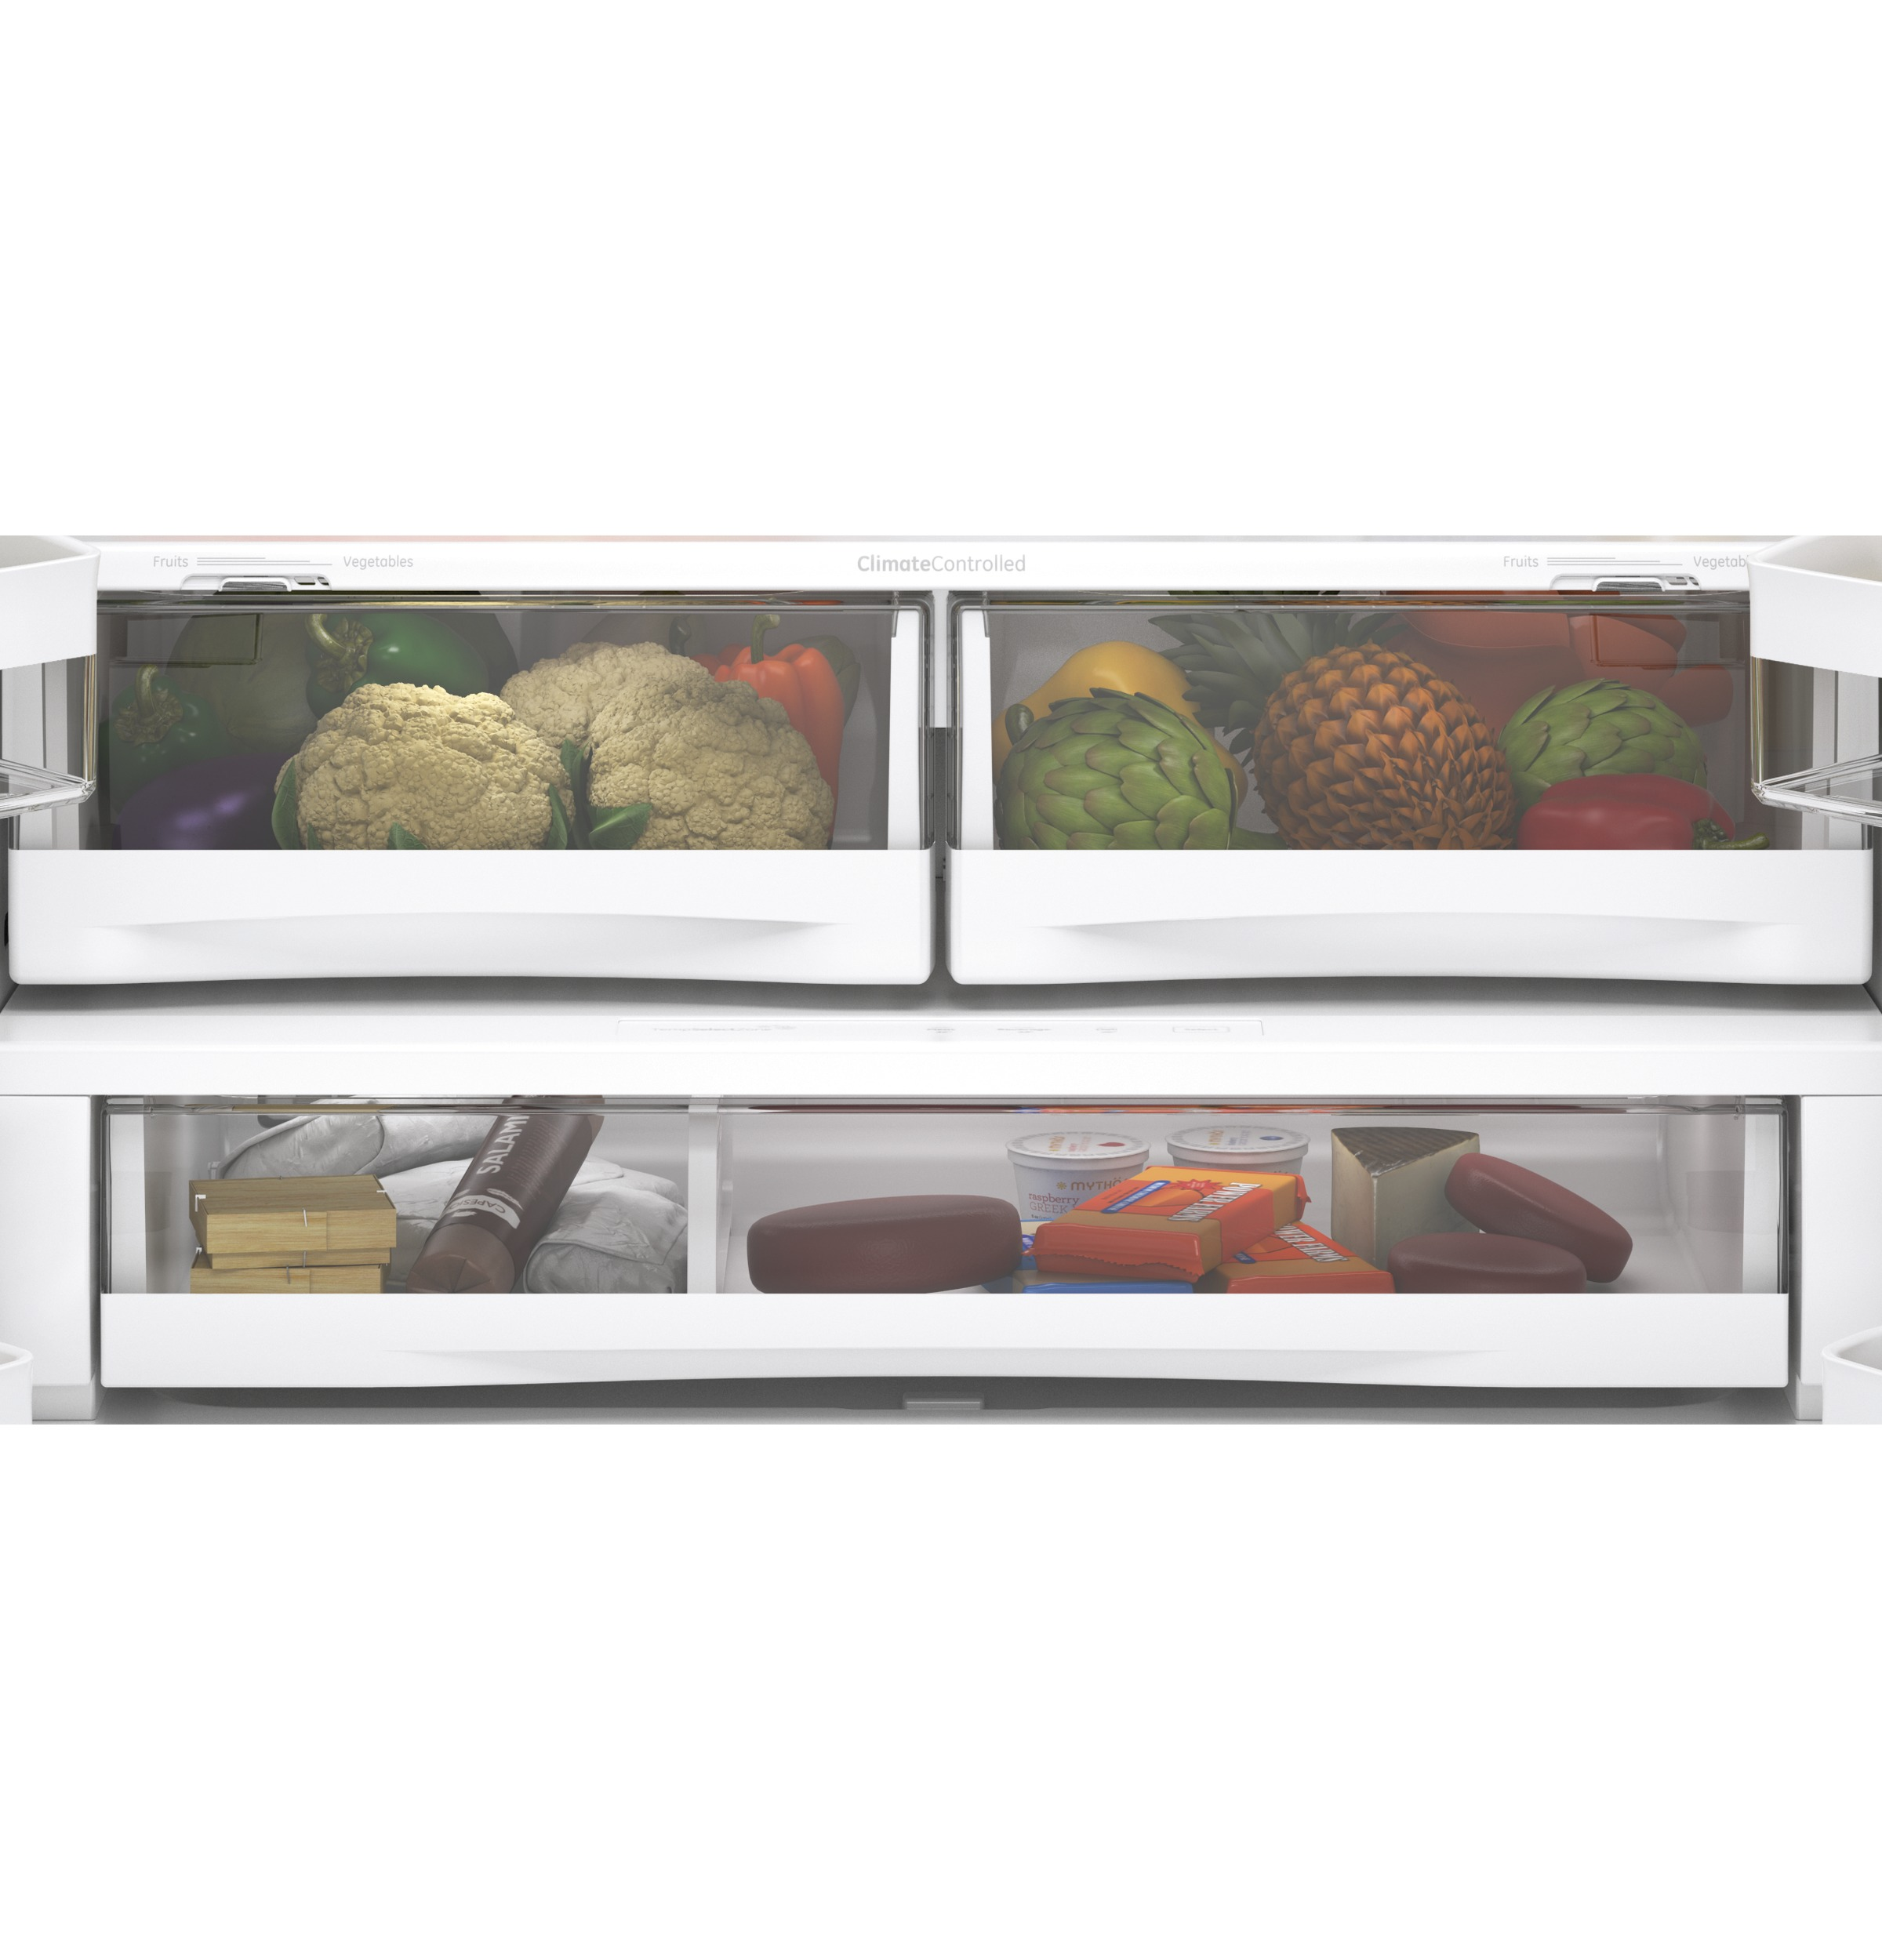 Model: GNE29GYNFS   GE GE® ENERGY STAR® 28.7 Cu. Ft. Fingerprint Resistant French-Door Refrigerator